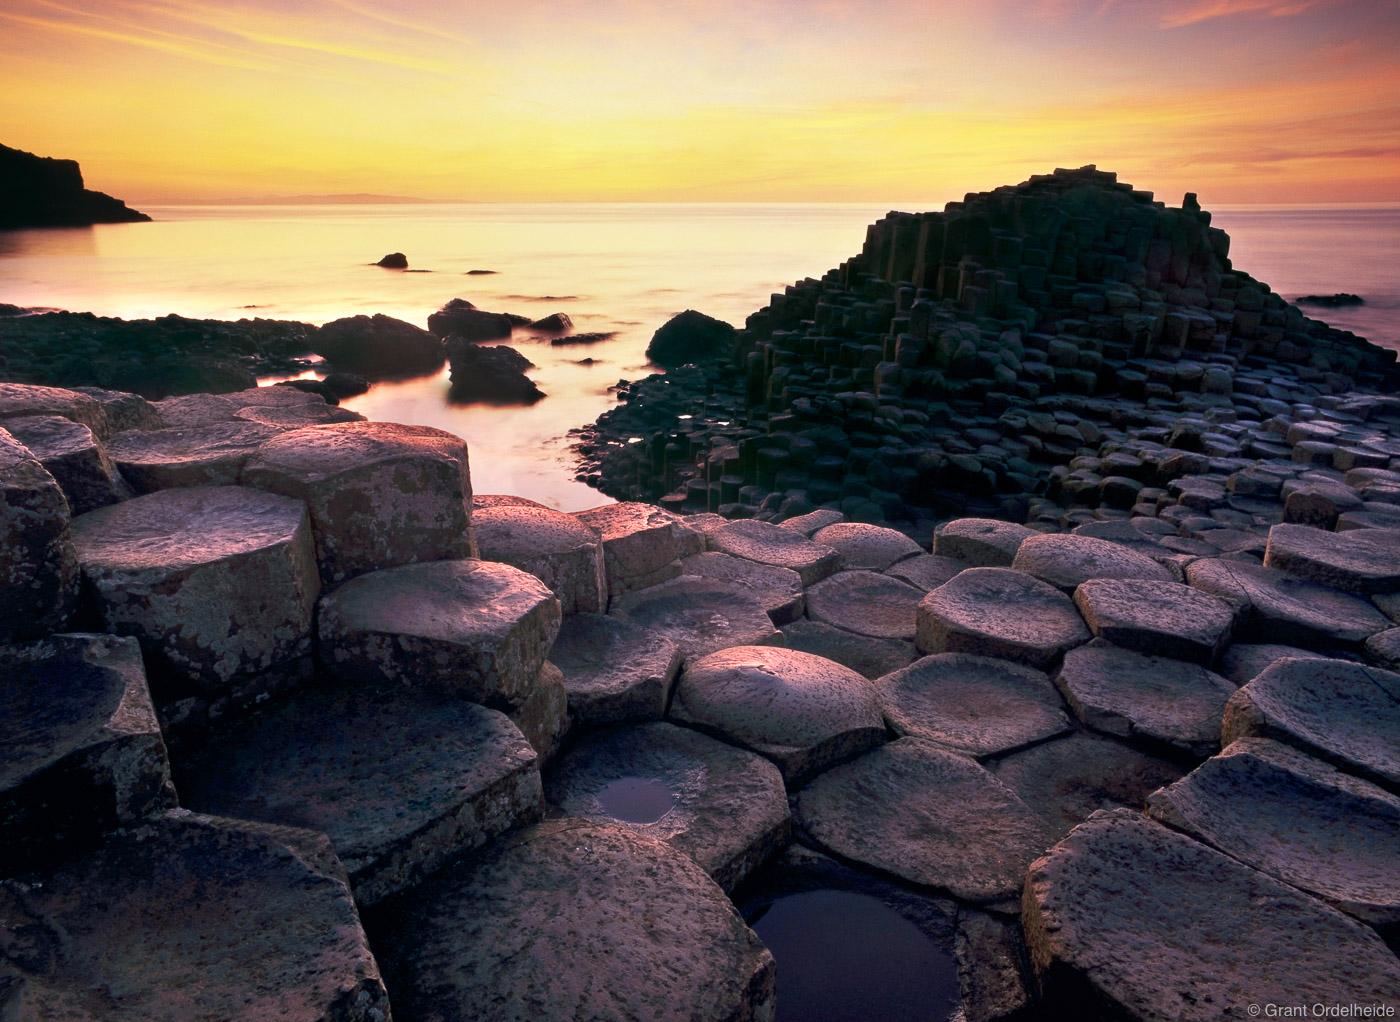 Sunset over the basalt columns of Giants Causeway in Northern Ireland